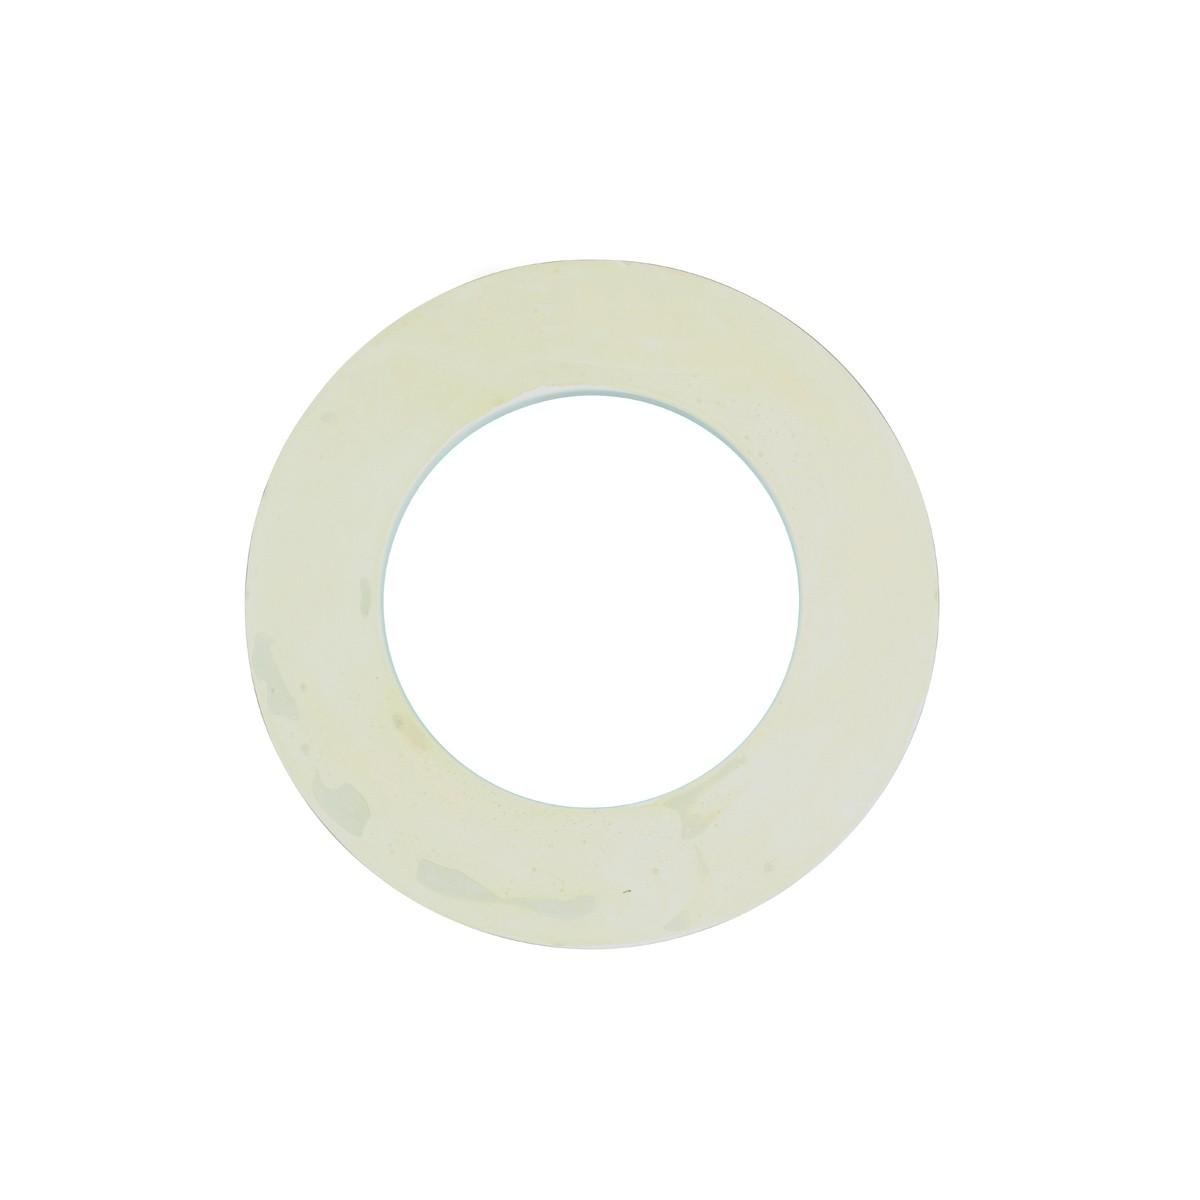 3 Spot Light Trim Medallions 6 ID White Urethane Set of 3 Light Medallion Light Medallions Lighting Medallion